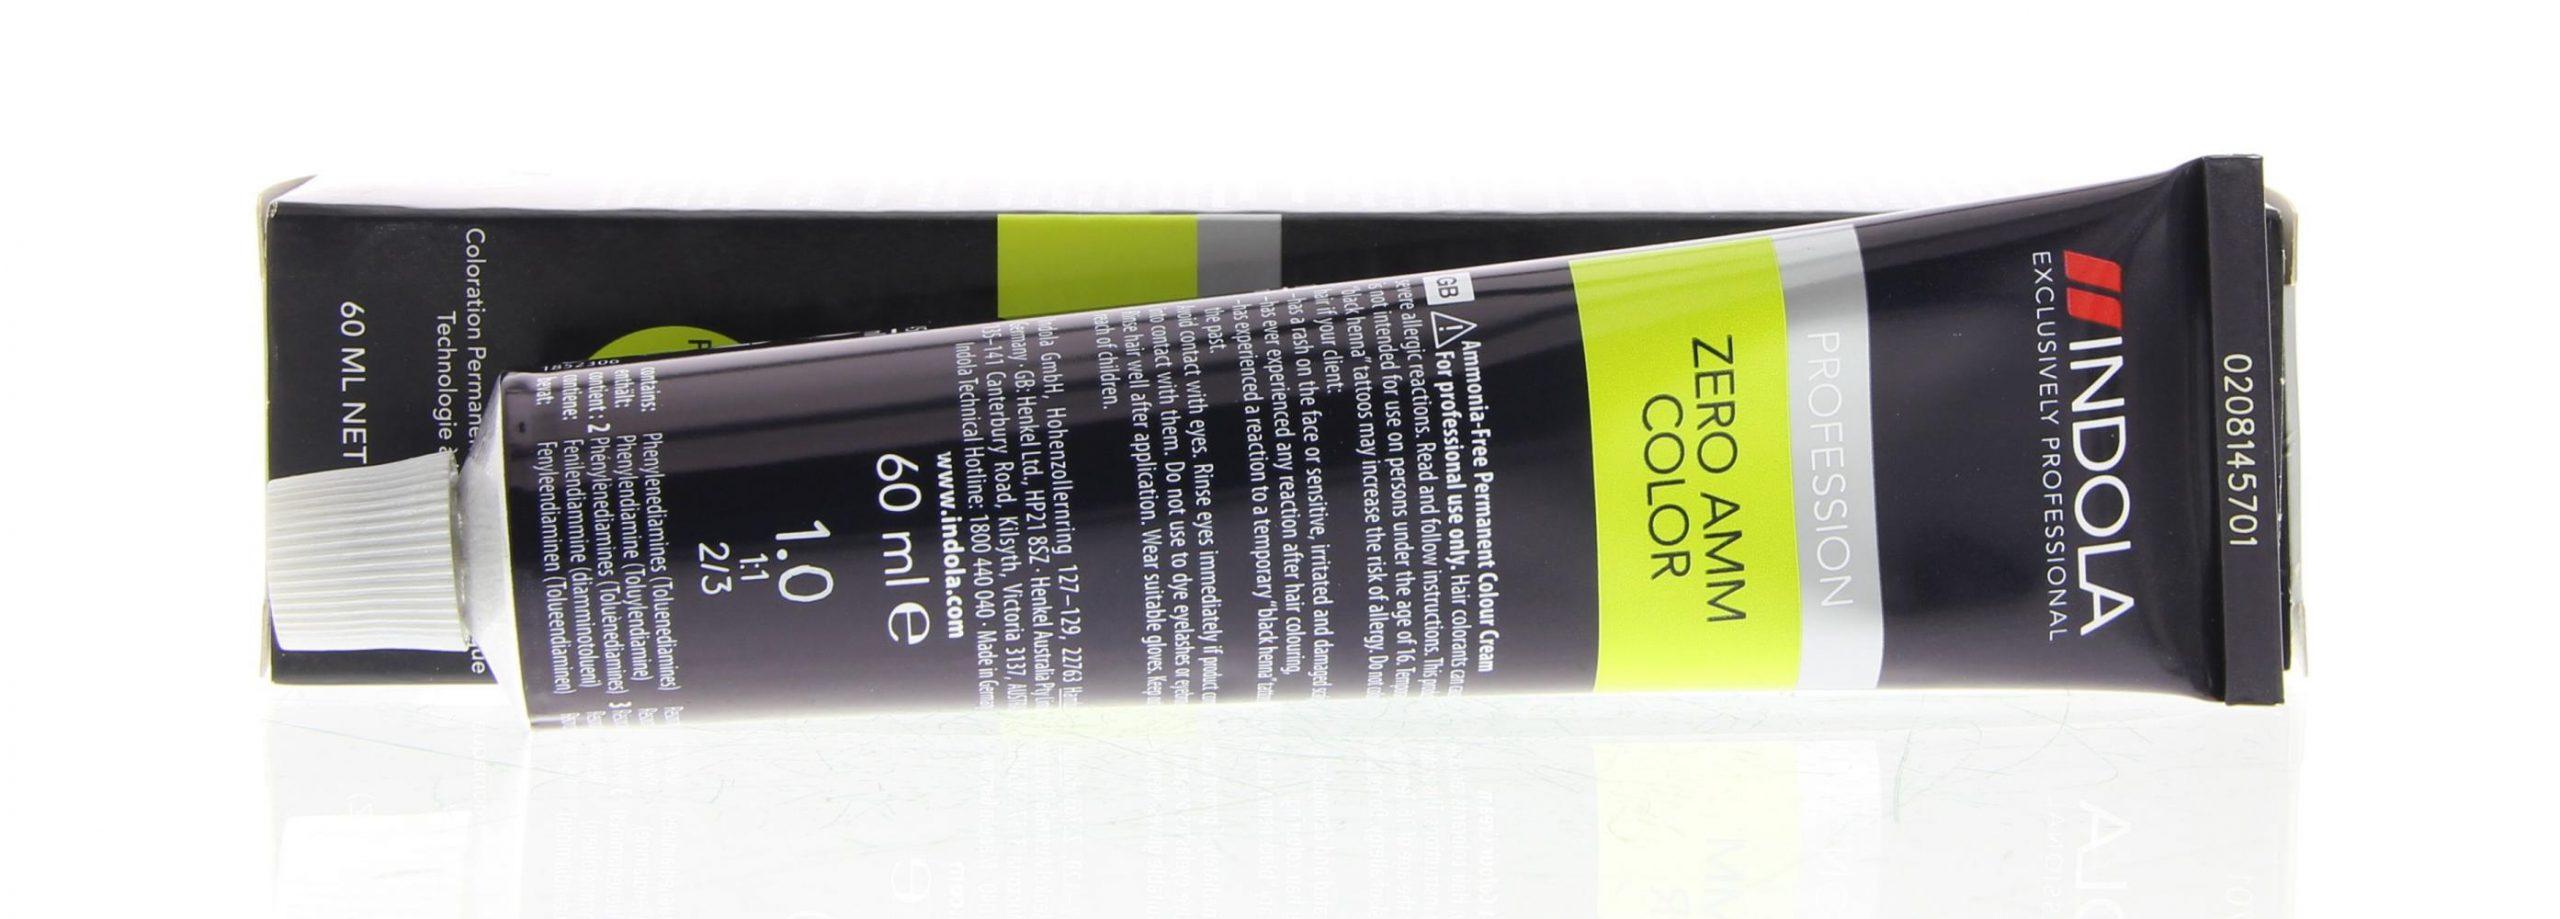 Indola Profession Zero Amm Color No Ammonia Permanent Color Haarverf 7.0  60ml